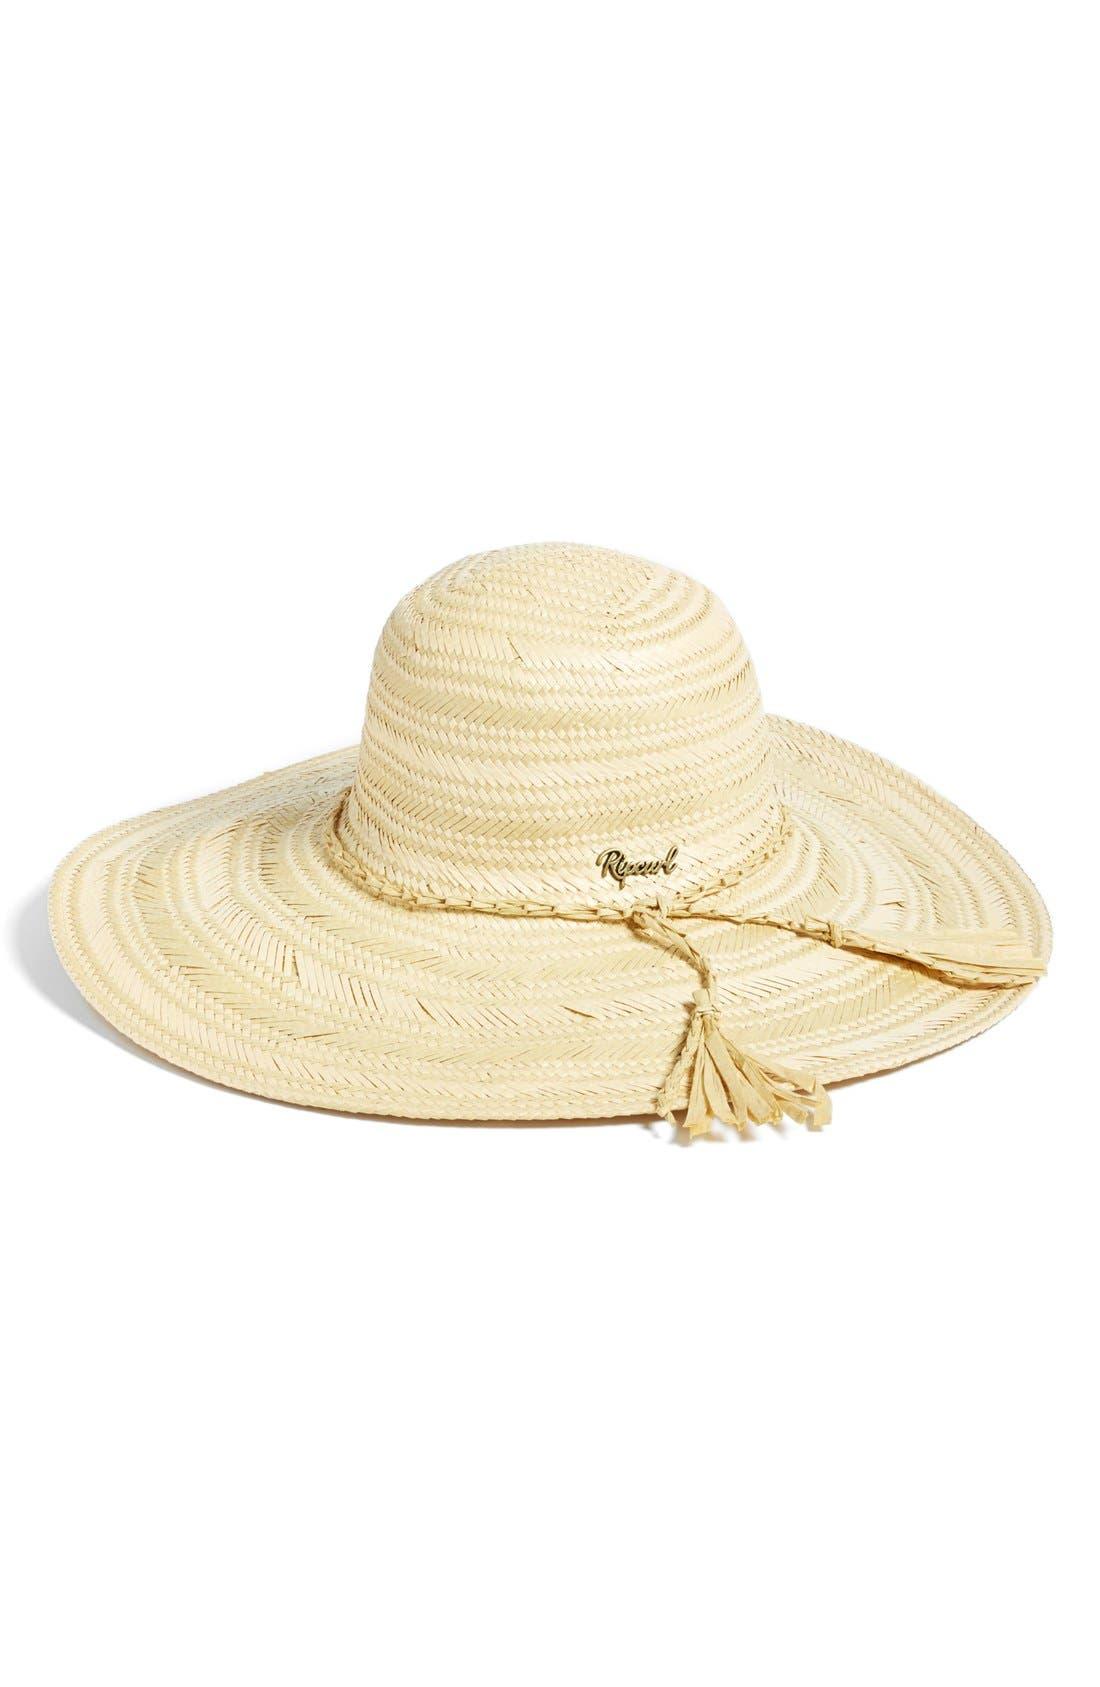 Alternate Image 1 Selected - Rip Curl 'Scarlet Boho' Woven Wide Brim Hat (Juniors)